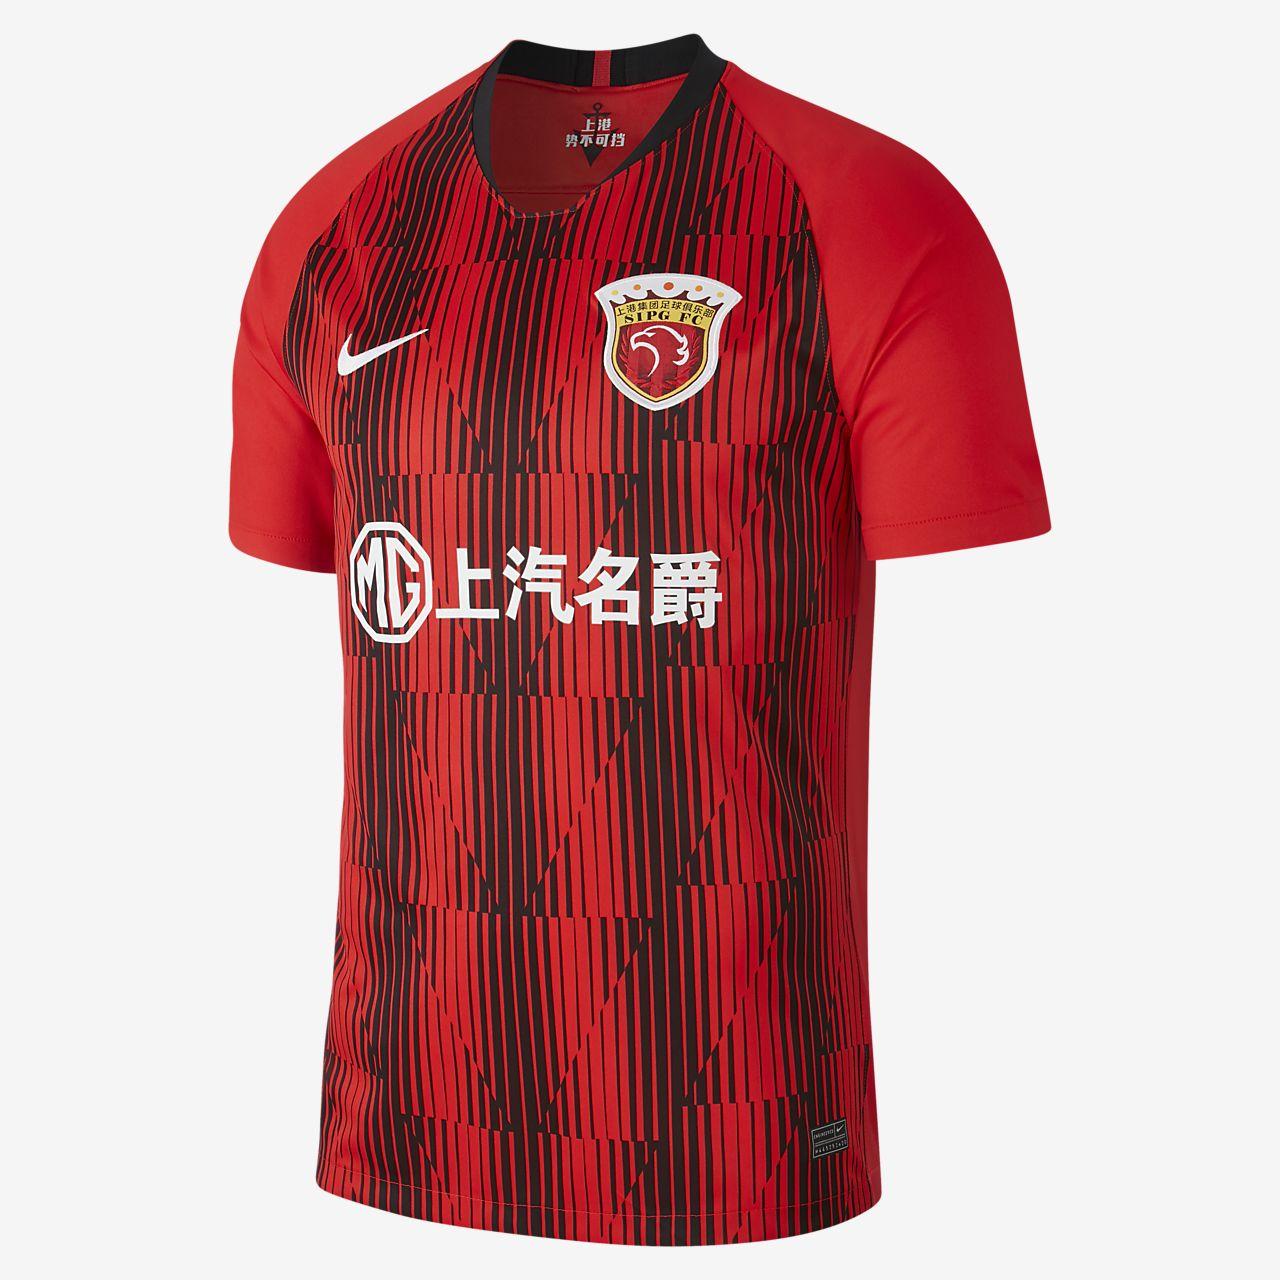 Maglia da calcio Shanghai SIPG FC 2020 Stadium da uomo - Home